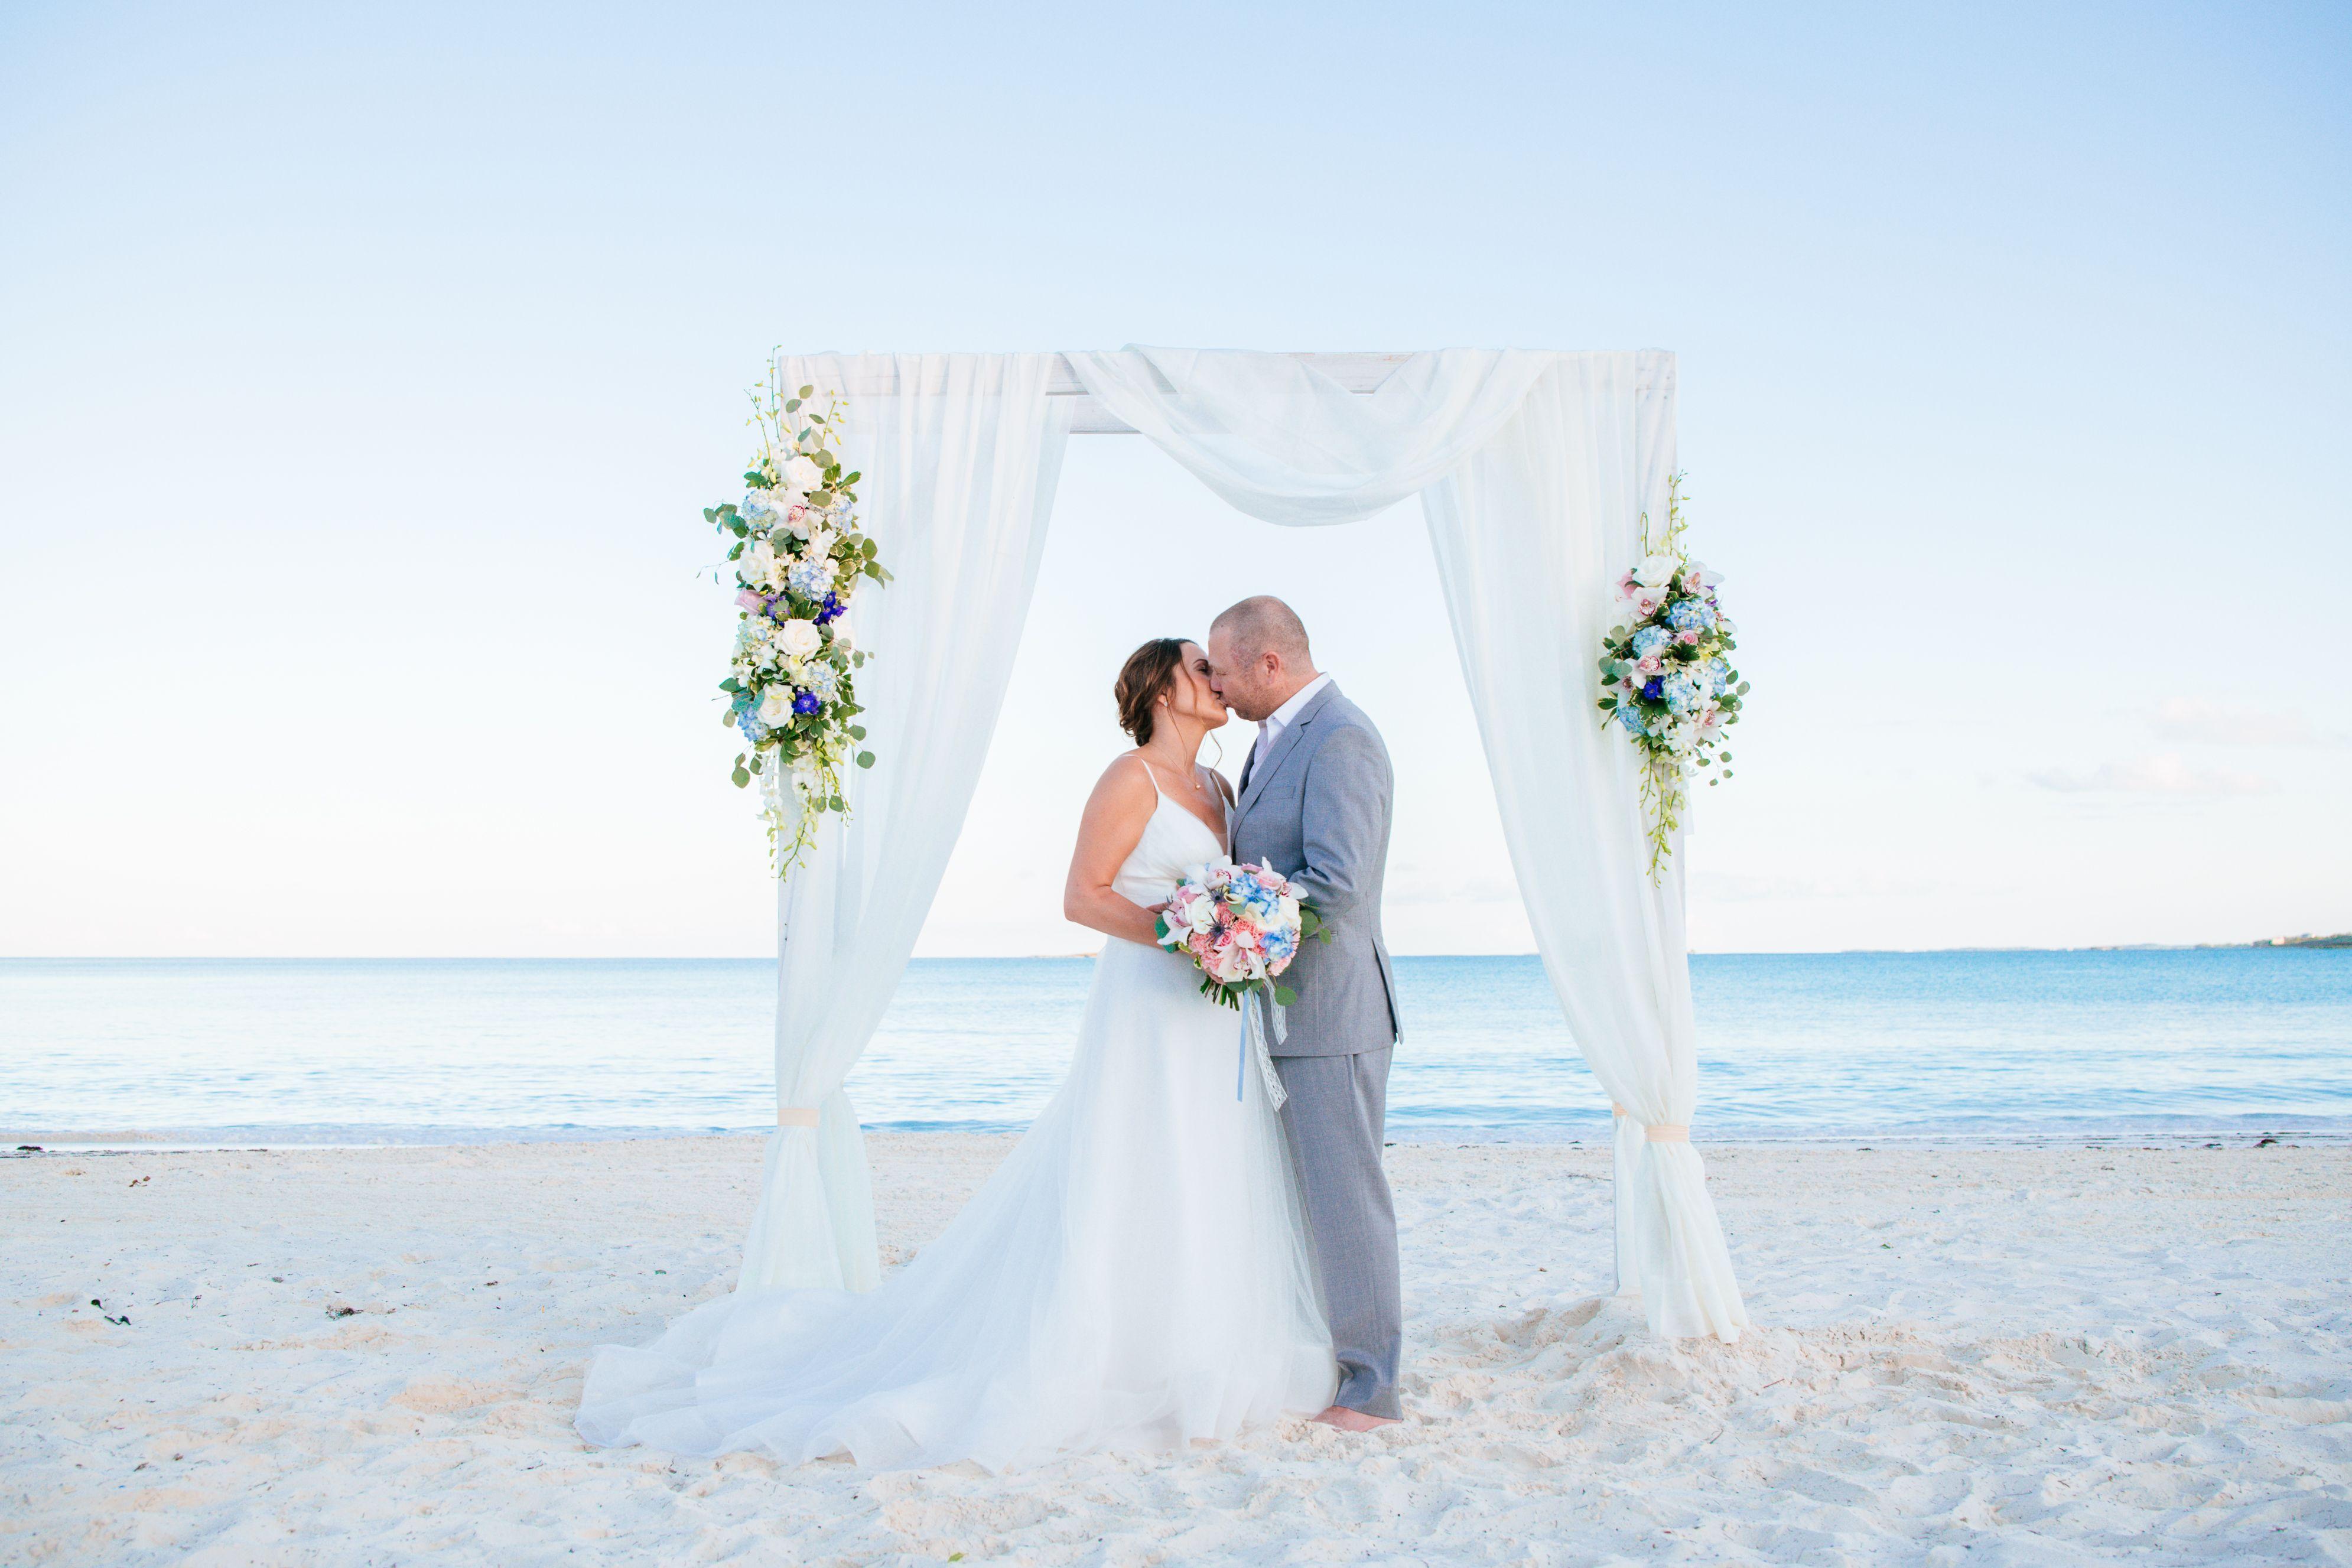 Elopement In The Bahamas Chic Bahamas Weddings In 2020 Bahamas Wedding Elope Wedding Elopement